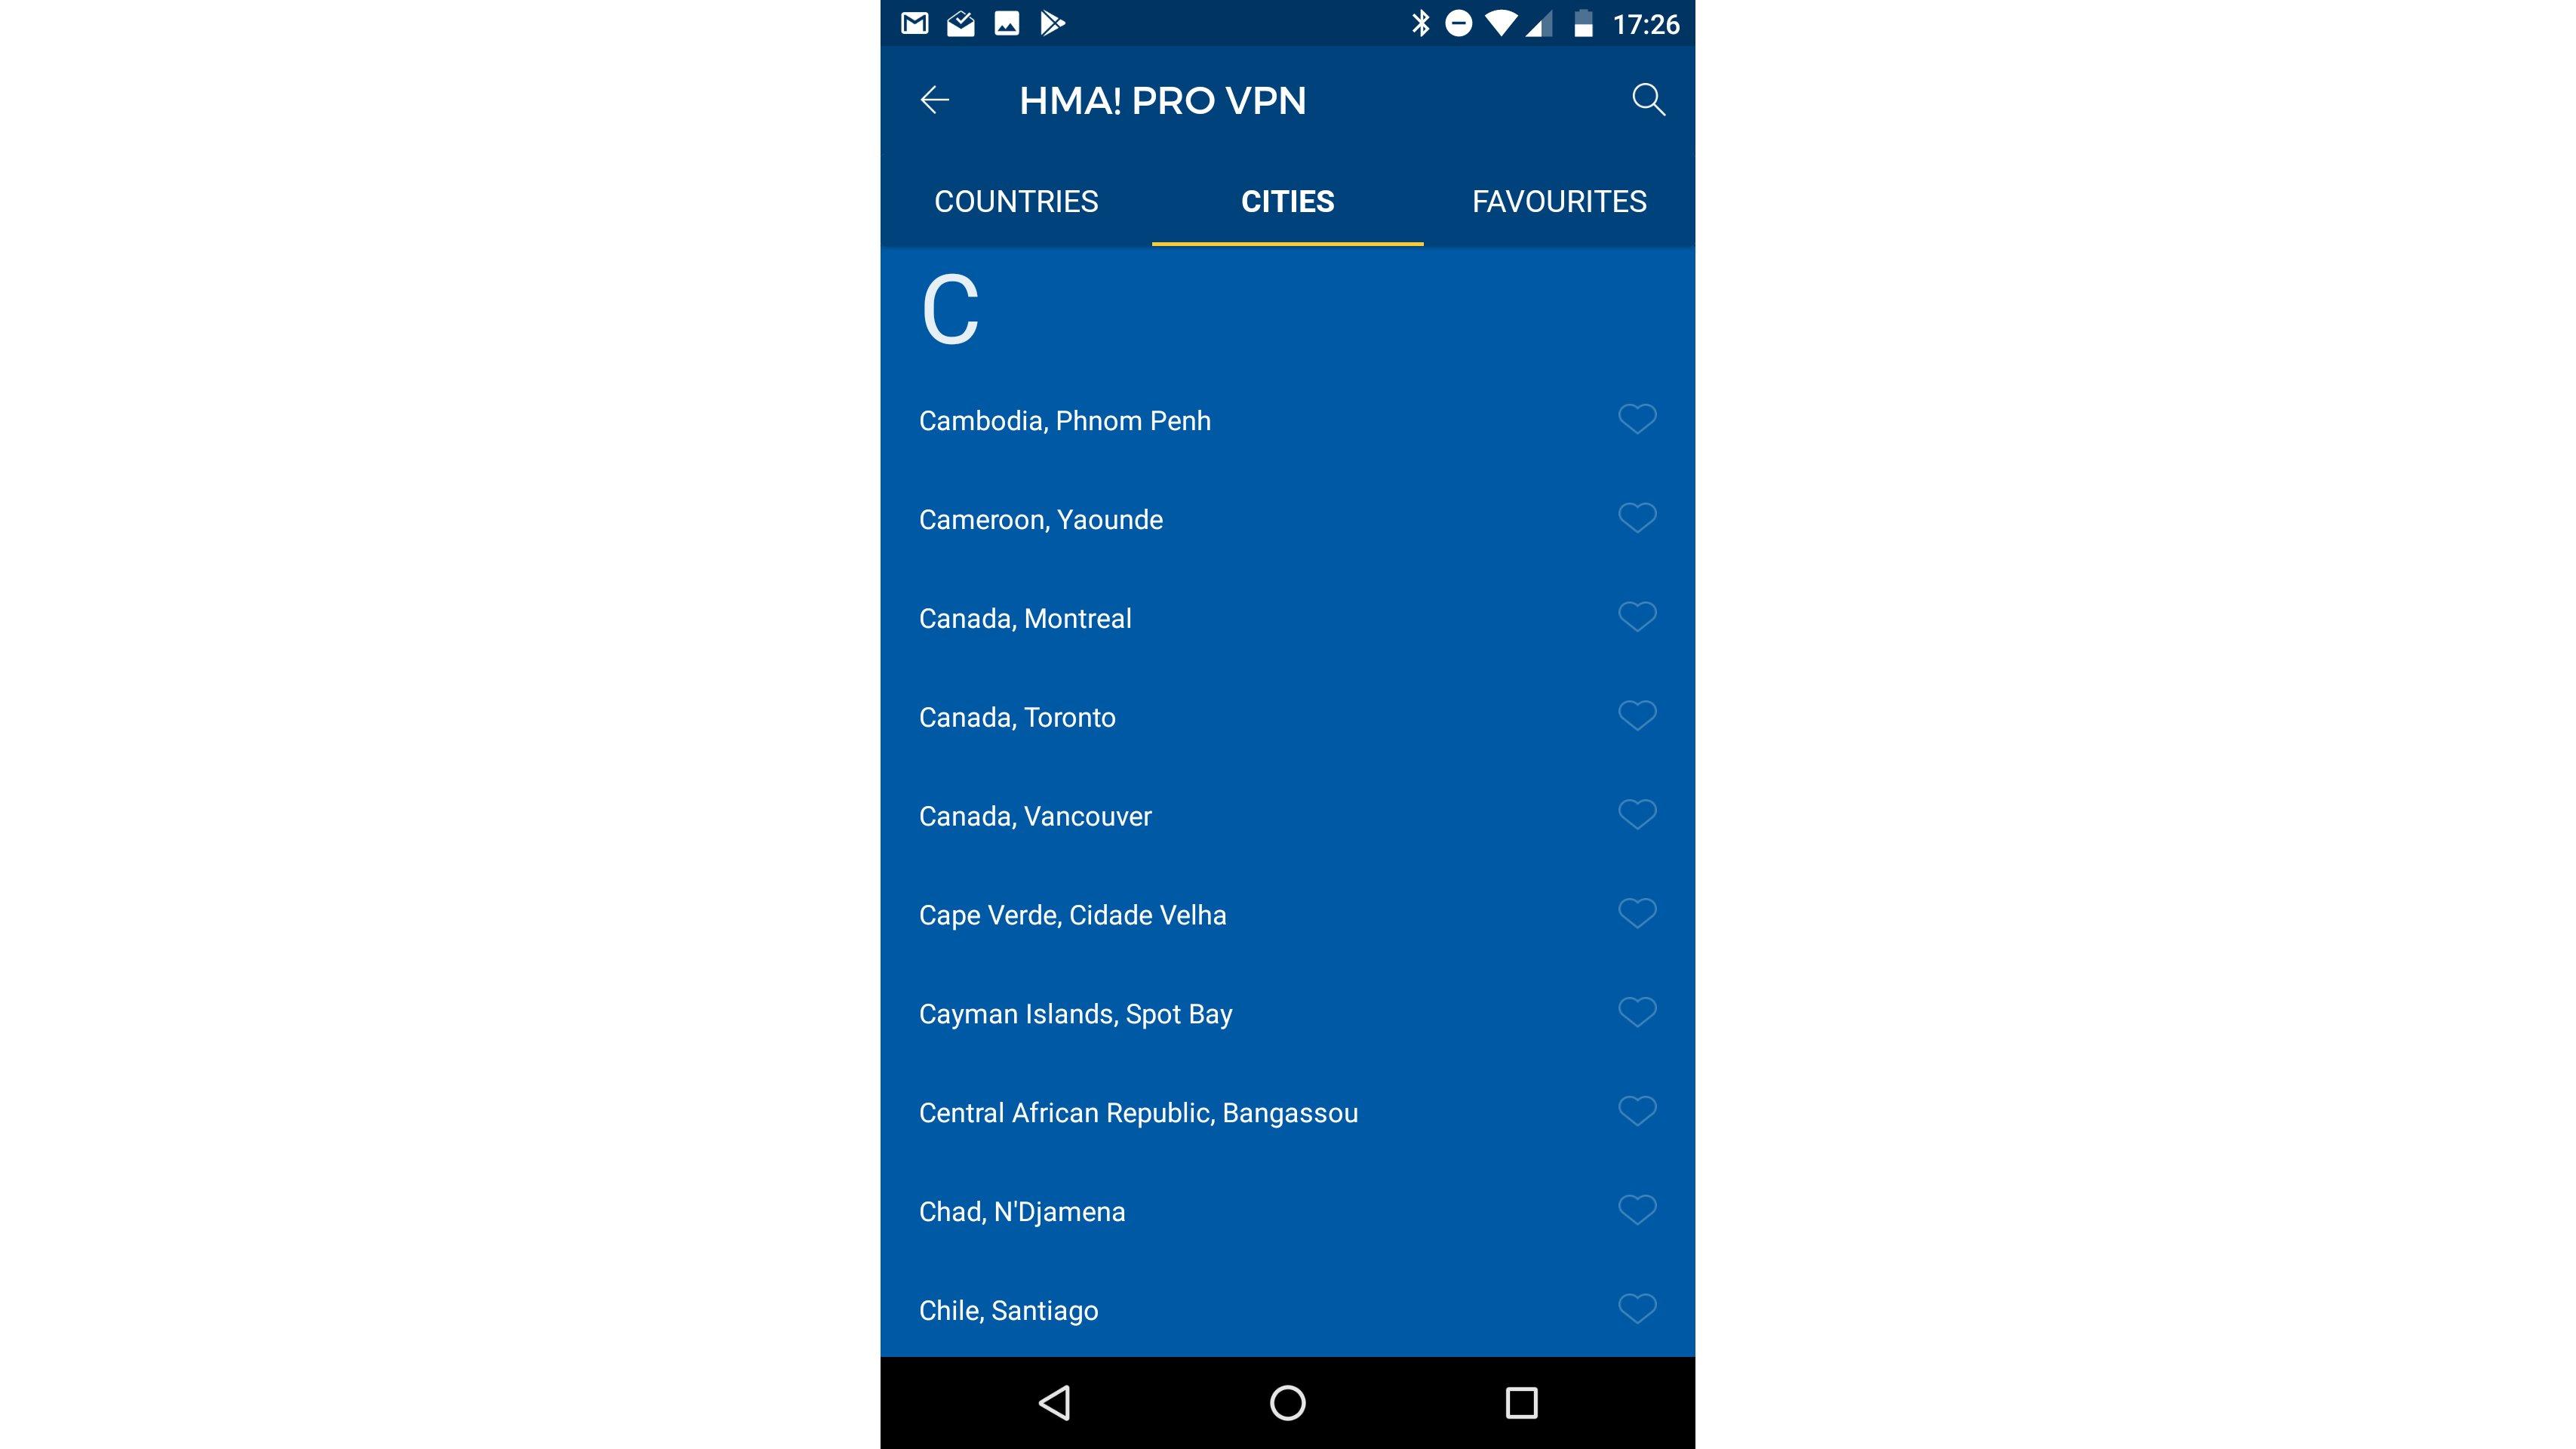 Hma pro vpn username and password android | HMA! Pro VPN 4 6